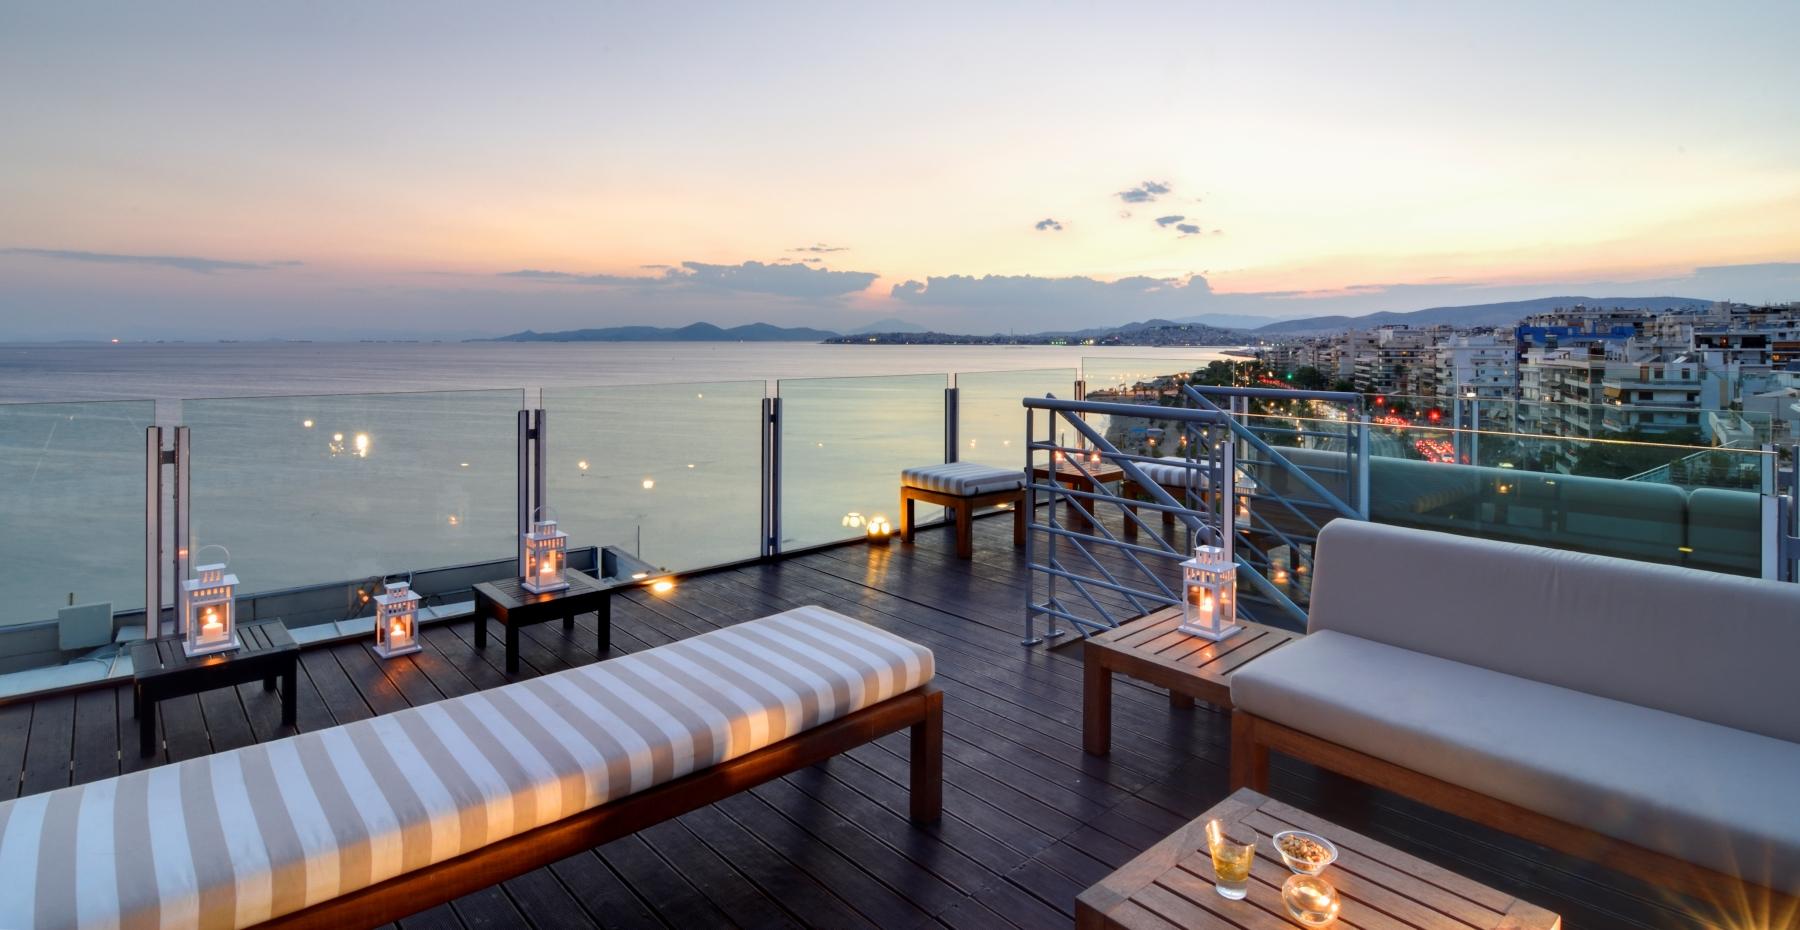 Poseidon Hotel Palaio Faliro